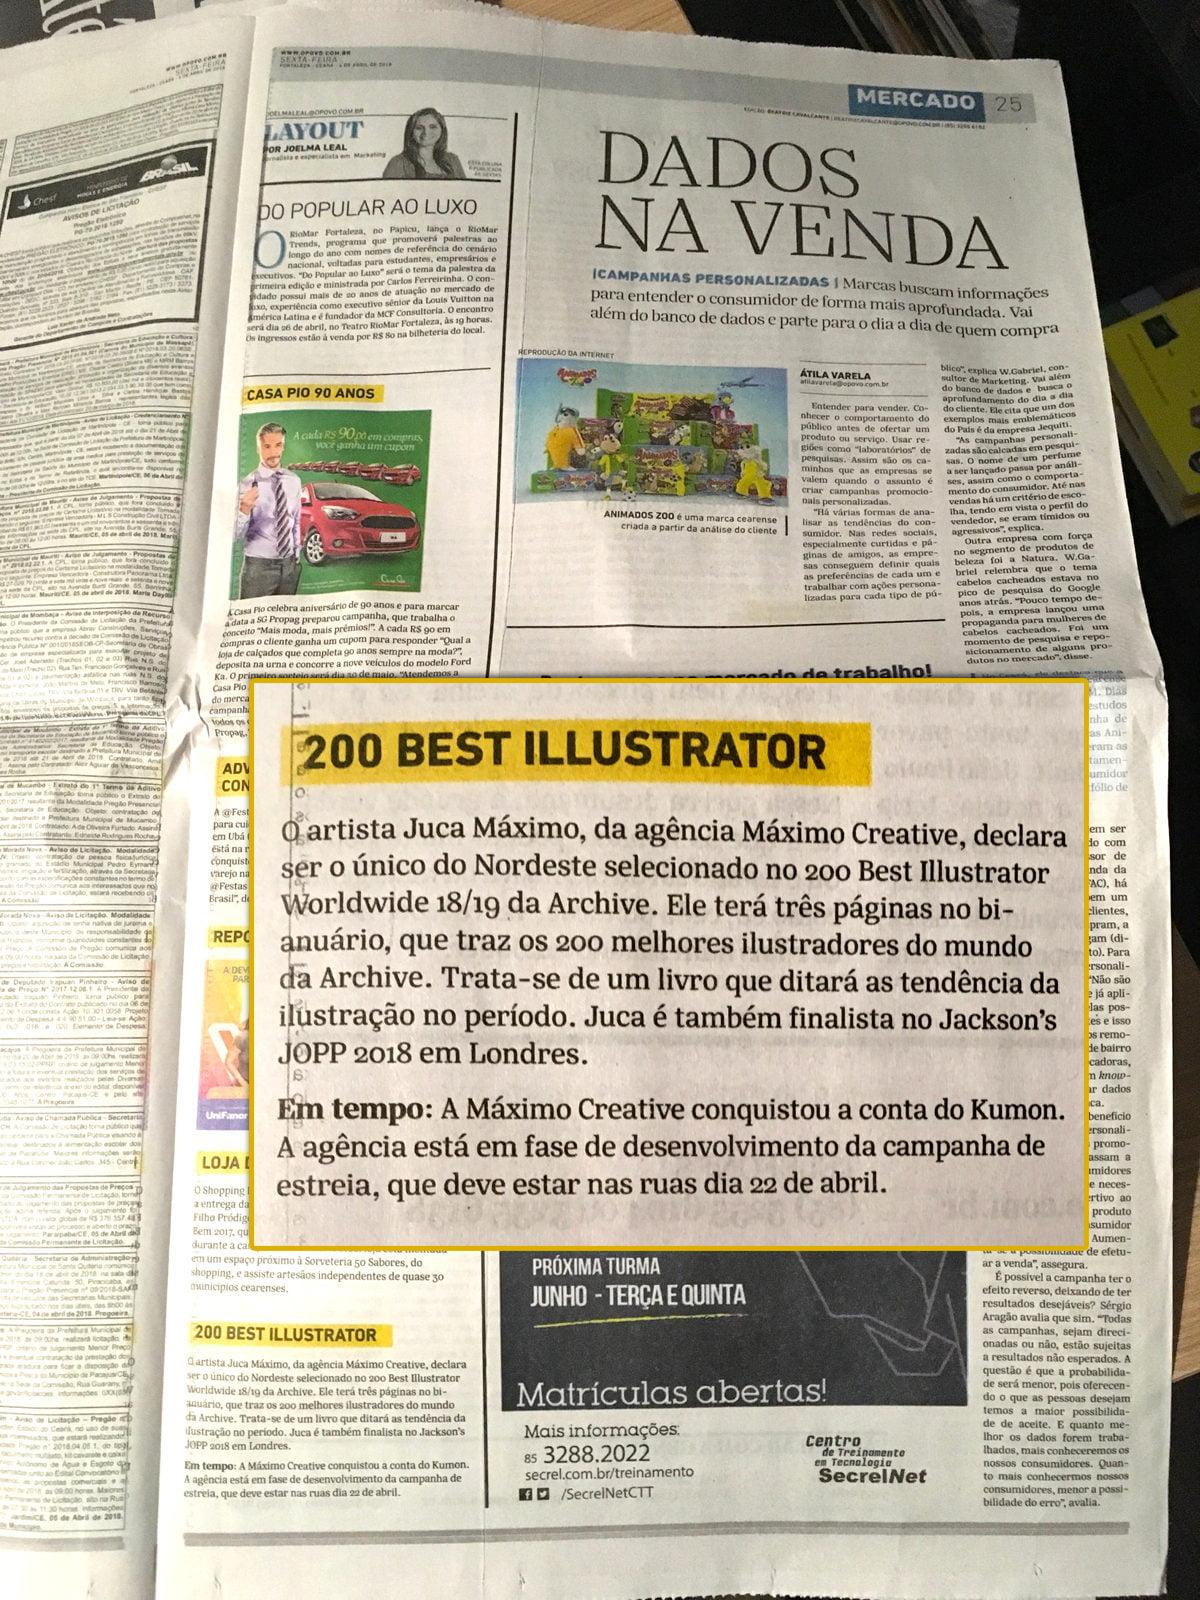 juca-maximo-200best-archive-jornal-opovo-1200x1600.jpg